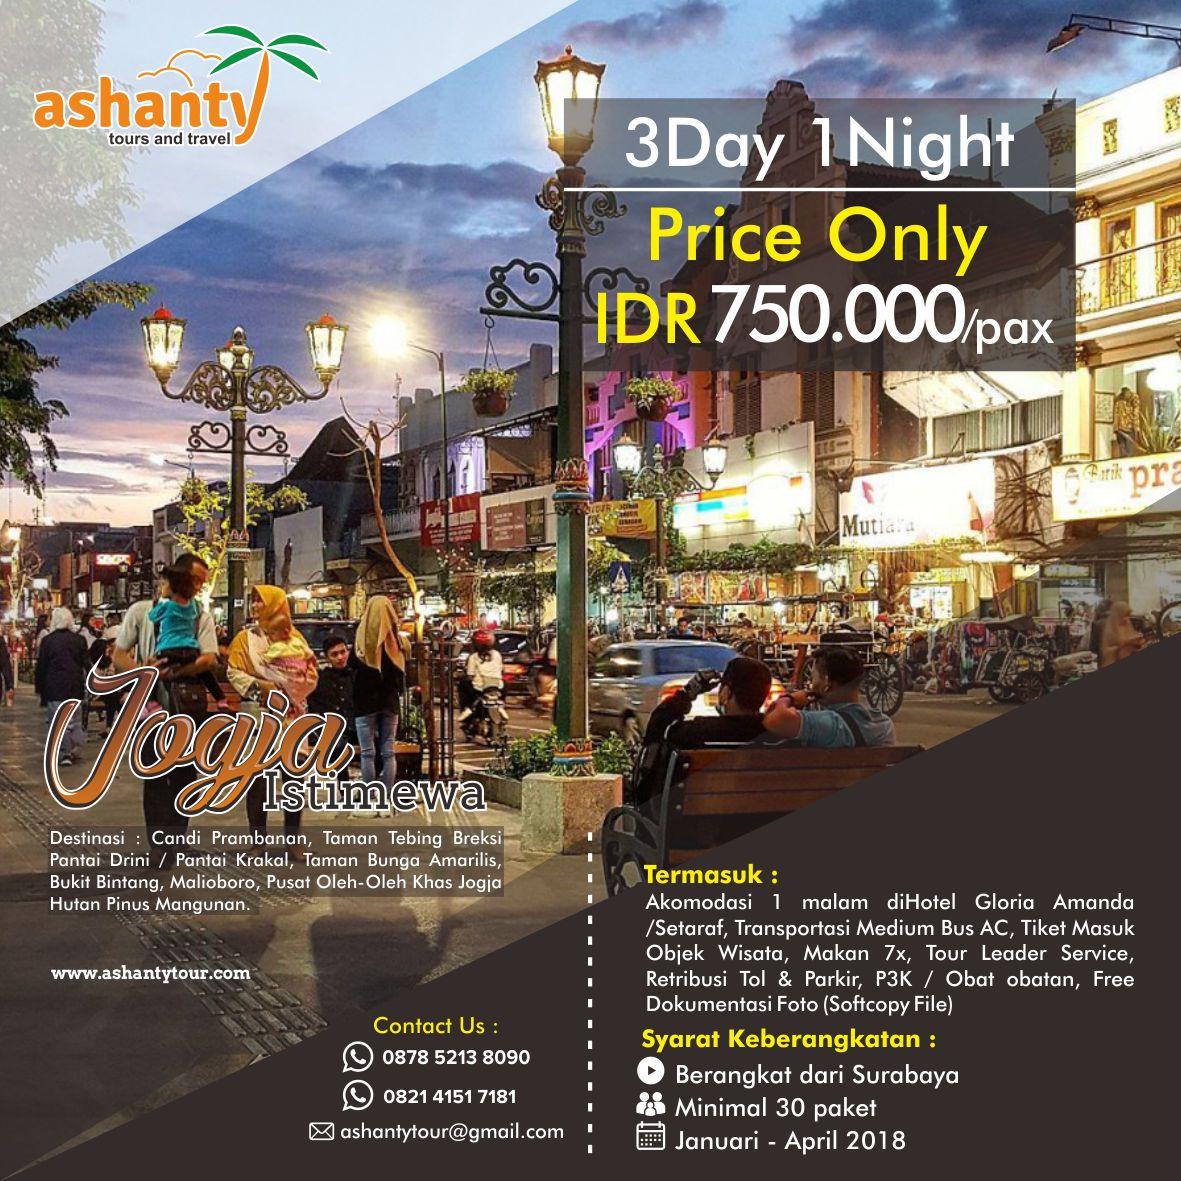 paket wisata jogja murah dari surabaya, paket liburan ke jogja dari surabaya, paket tour jogja berangkat dari surabaya